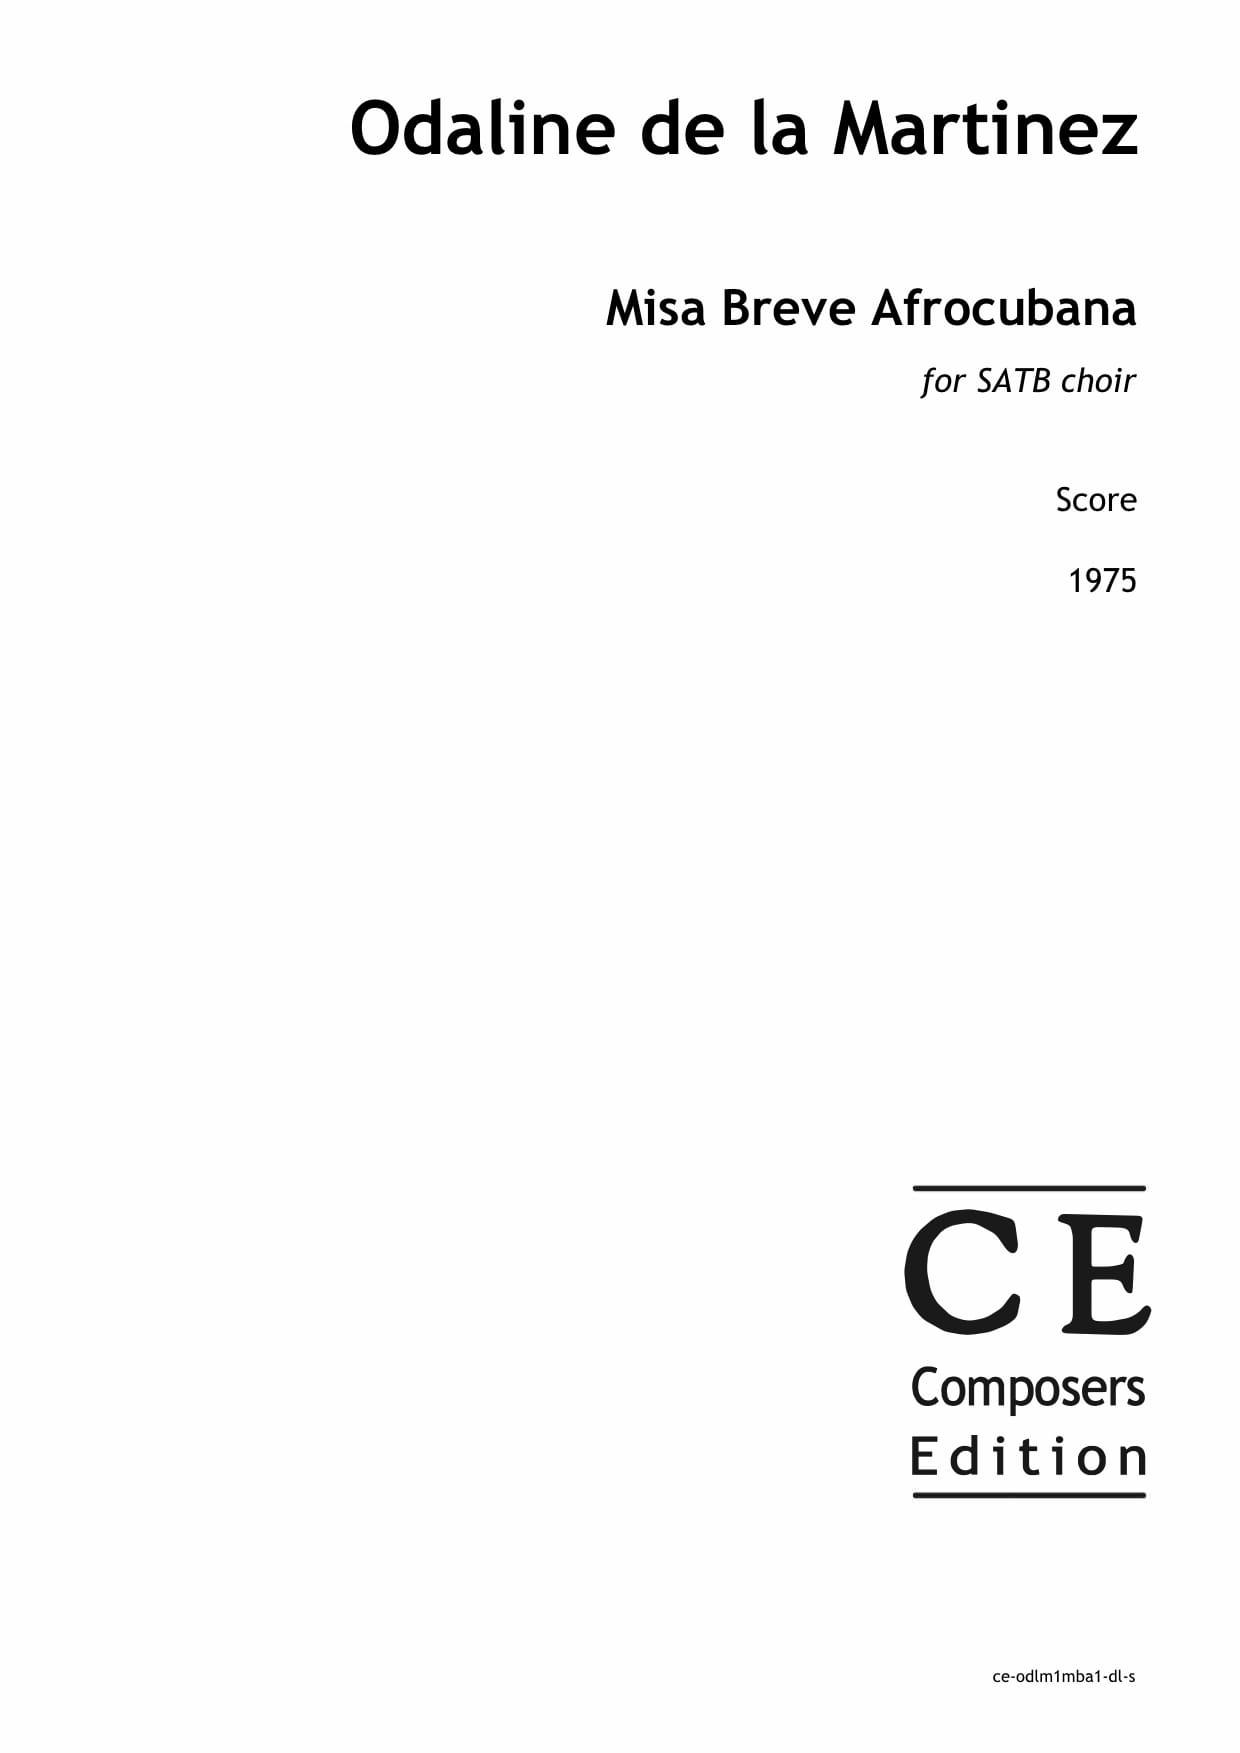 Odaline de la Martinez: Misa Breve Afrocubana for SATB choir